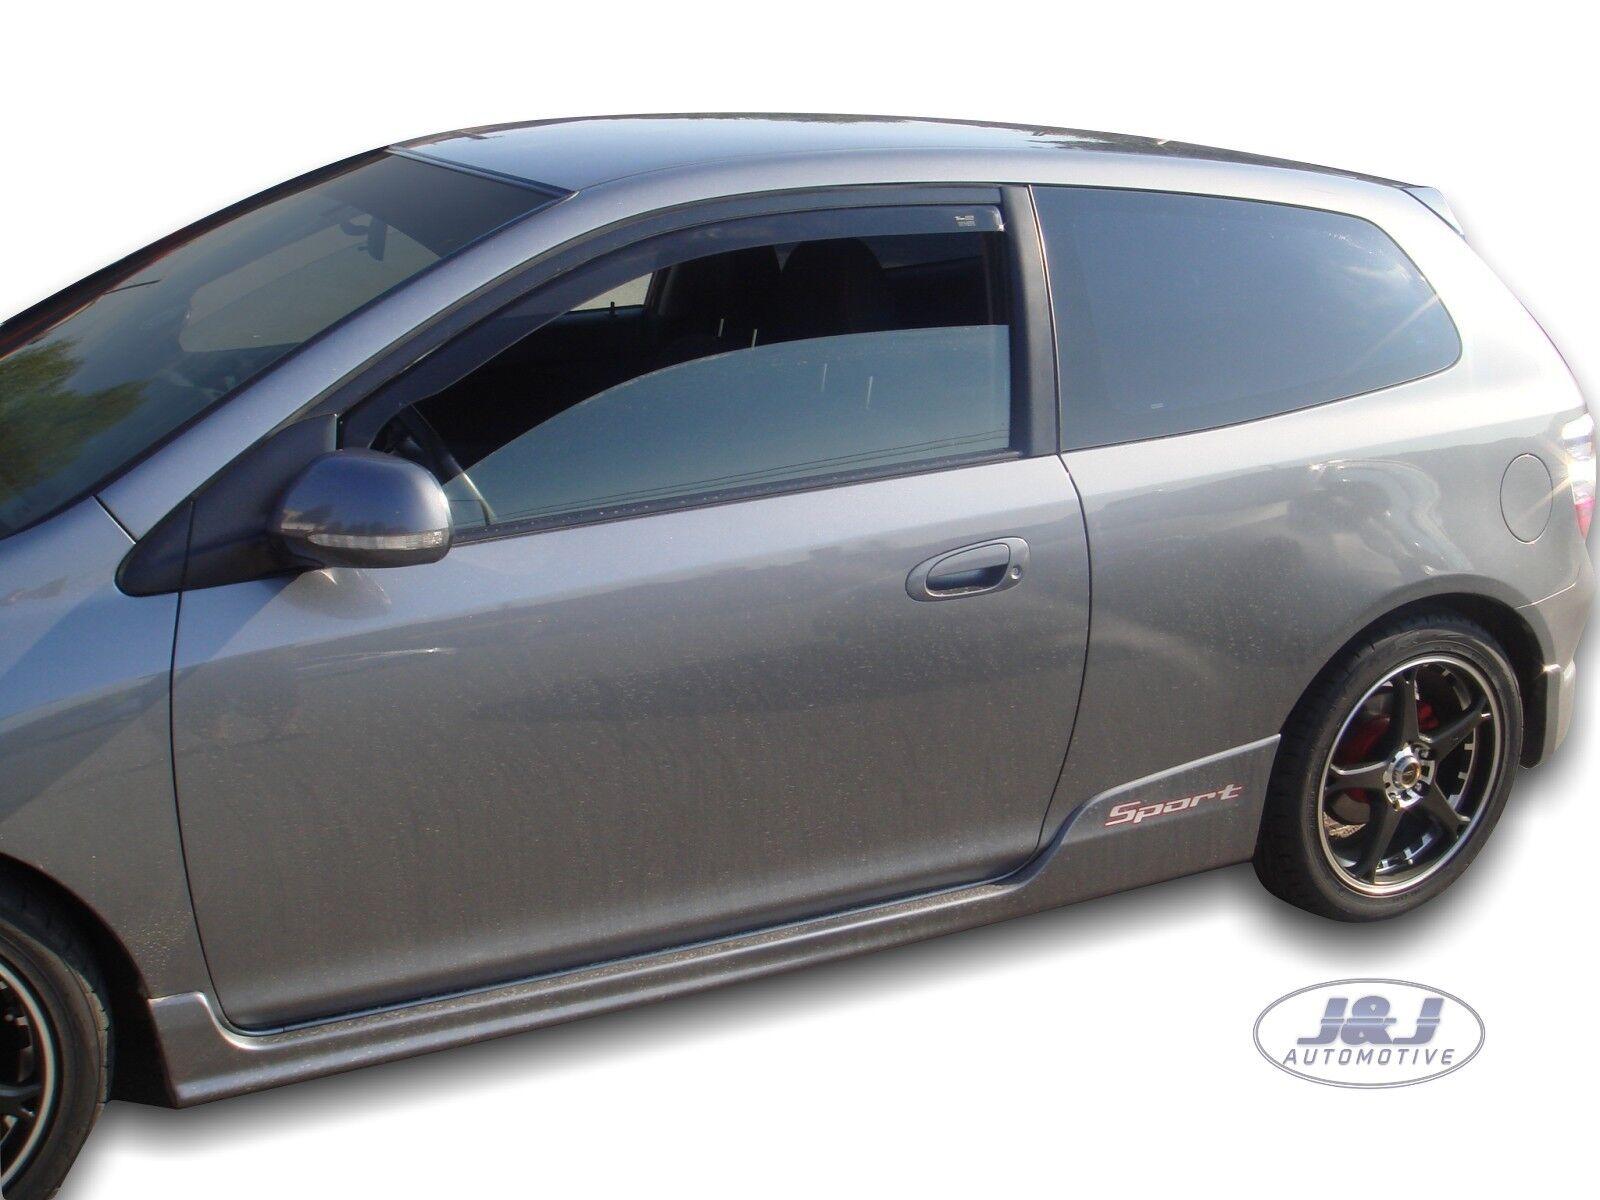 HONDA CIVIC mk7 5-doors Hatchback 2001-2005 4-pc Wind Deflectors HEKO Tinted